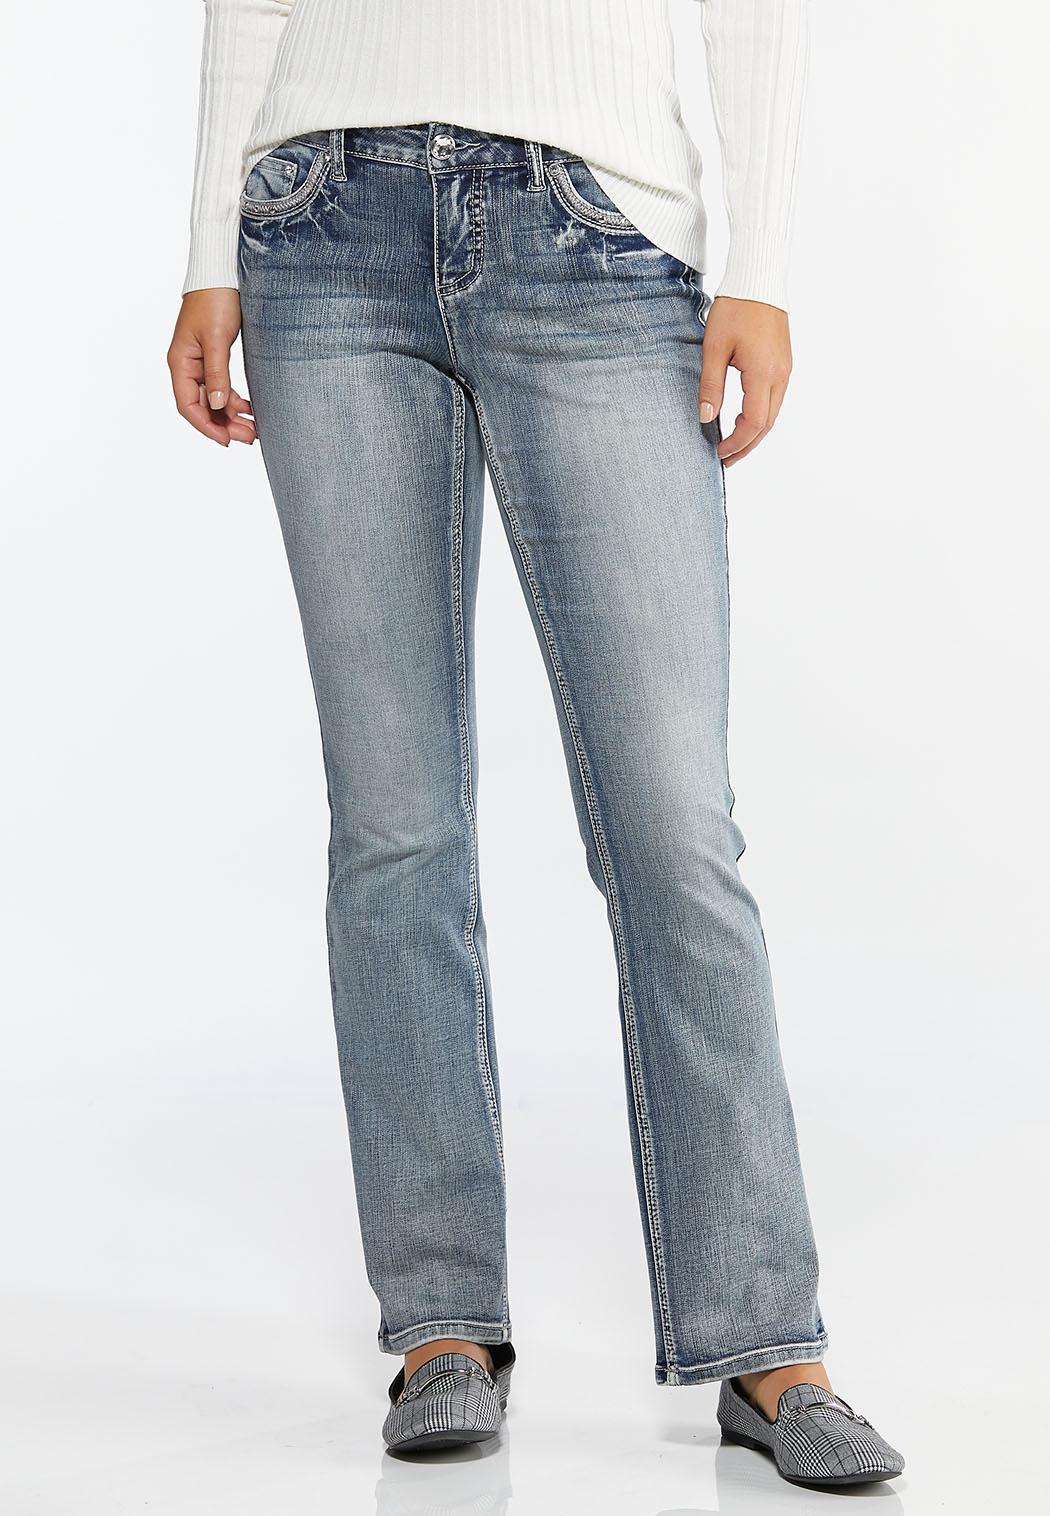 Petite Embellished Bootcut Jeans (Item #44400359)